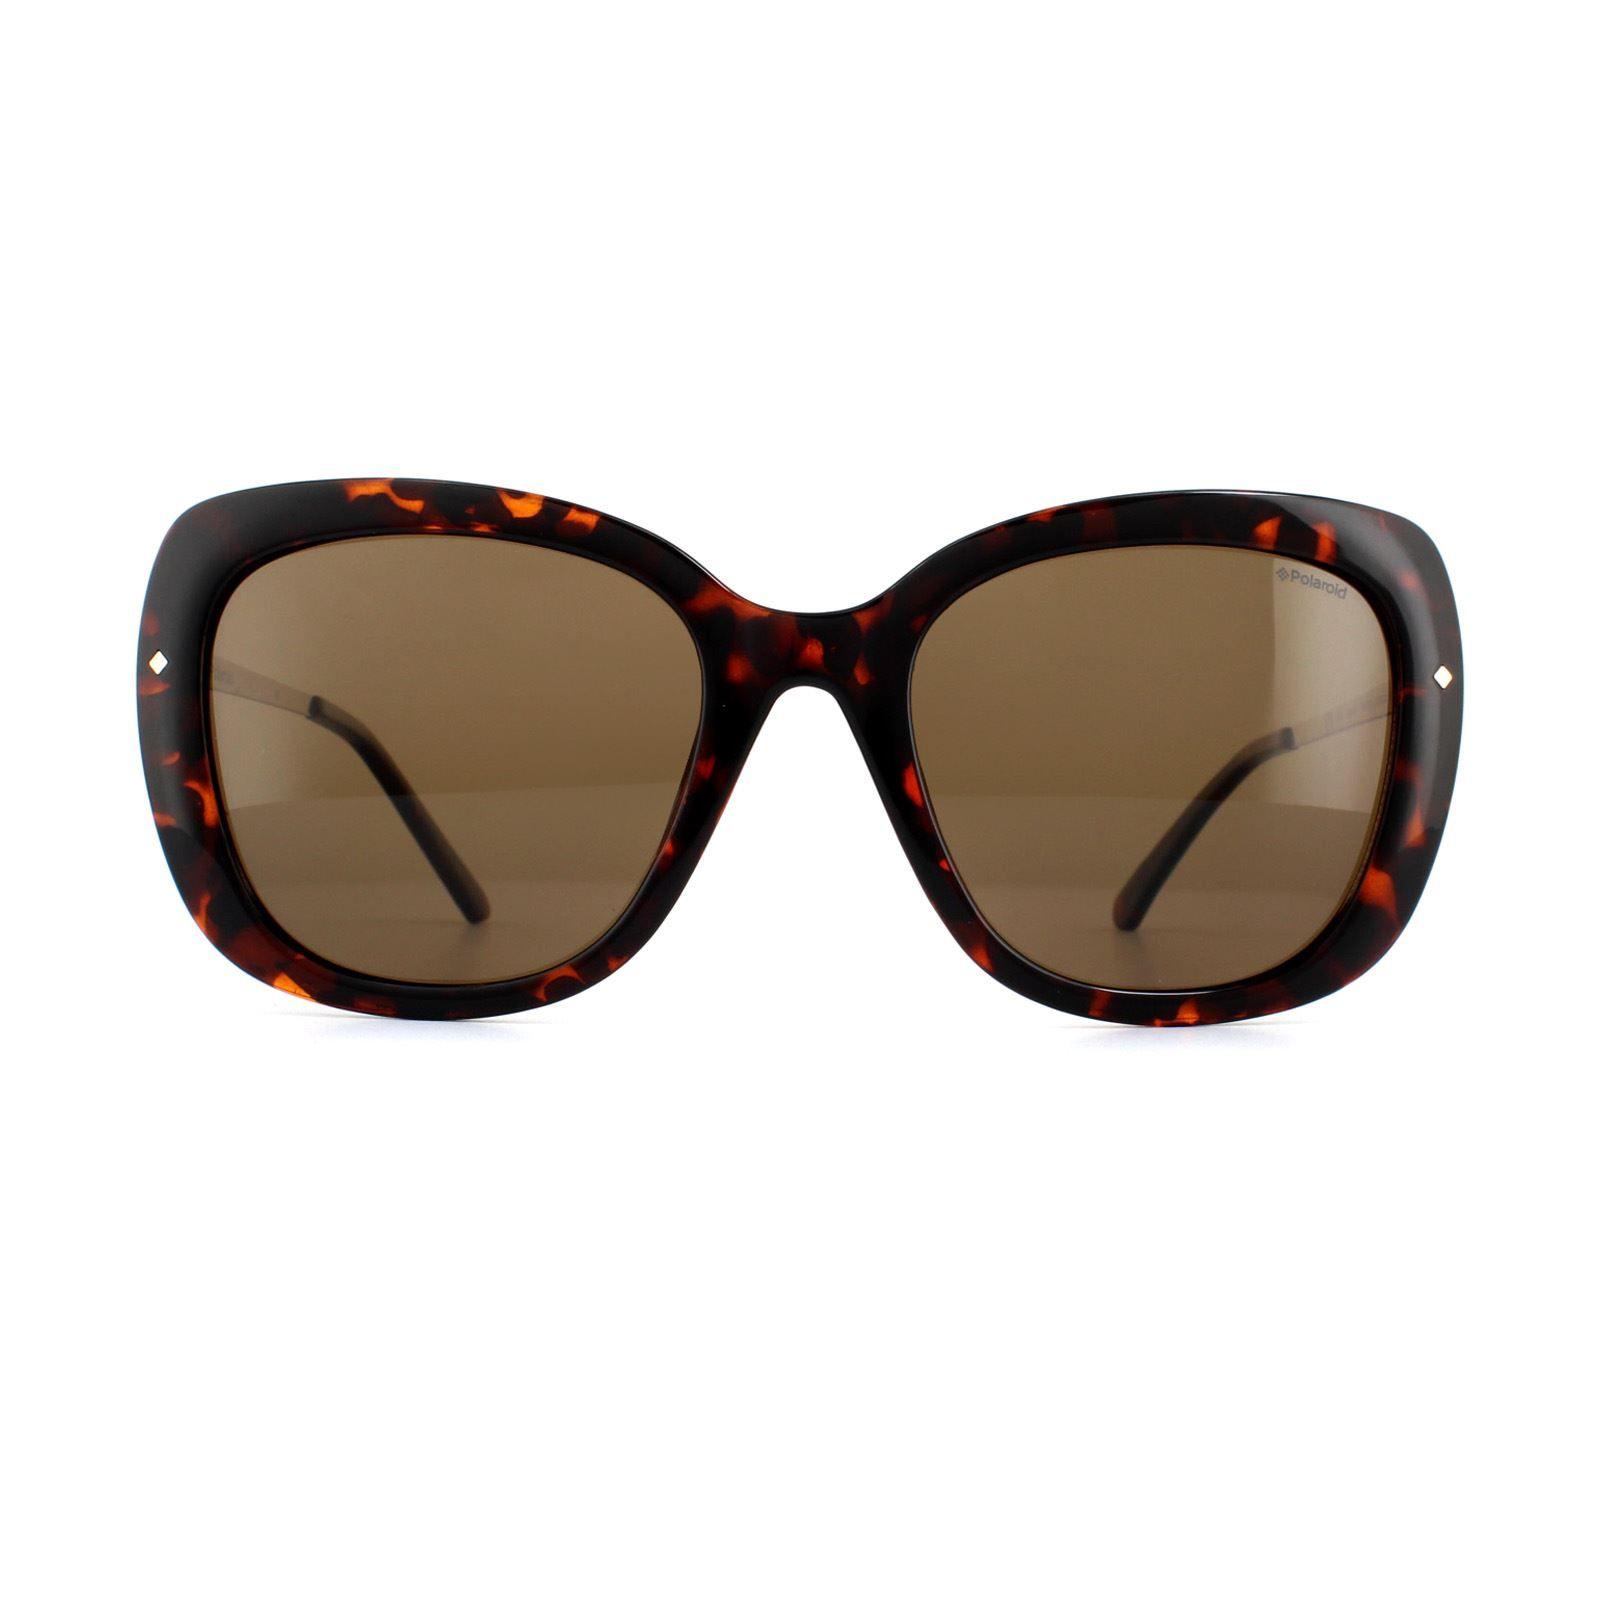 Polaroid Sunglasses PLD 4044/S NHO IG Havana Gold Brown Polarized